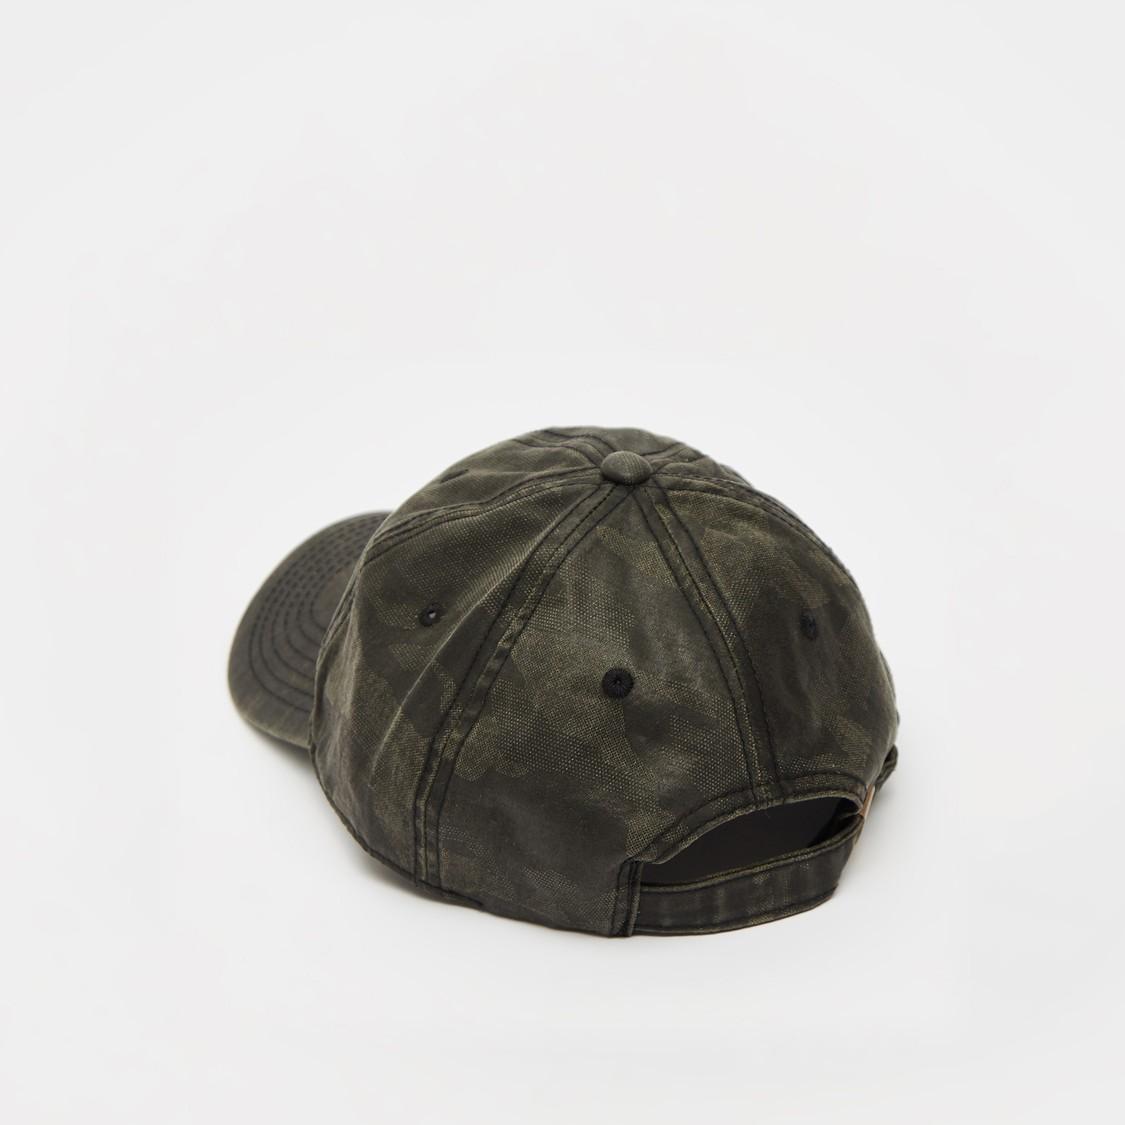 Camouflage Print Adjustable Cap